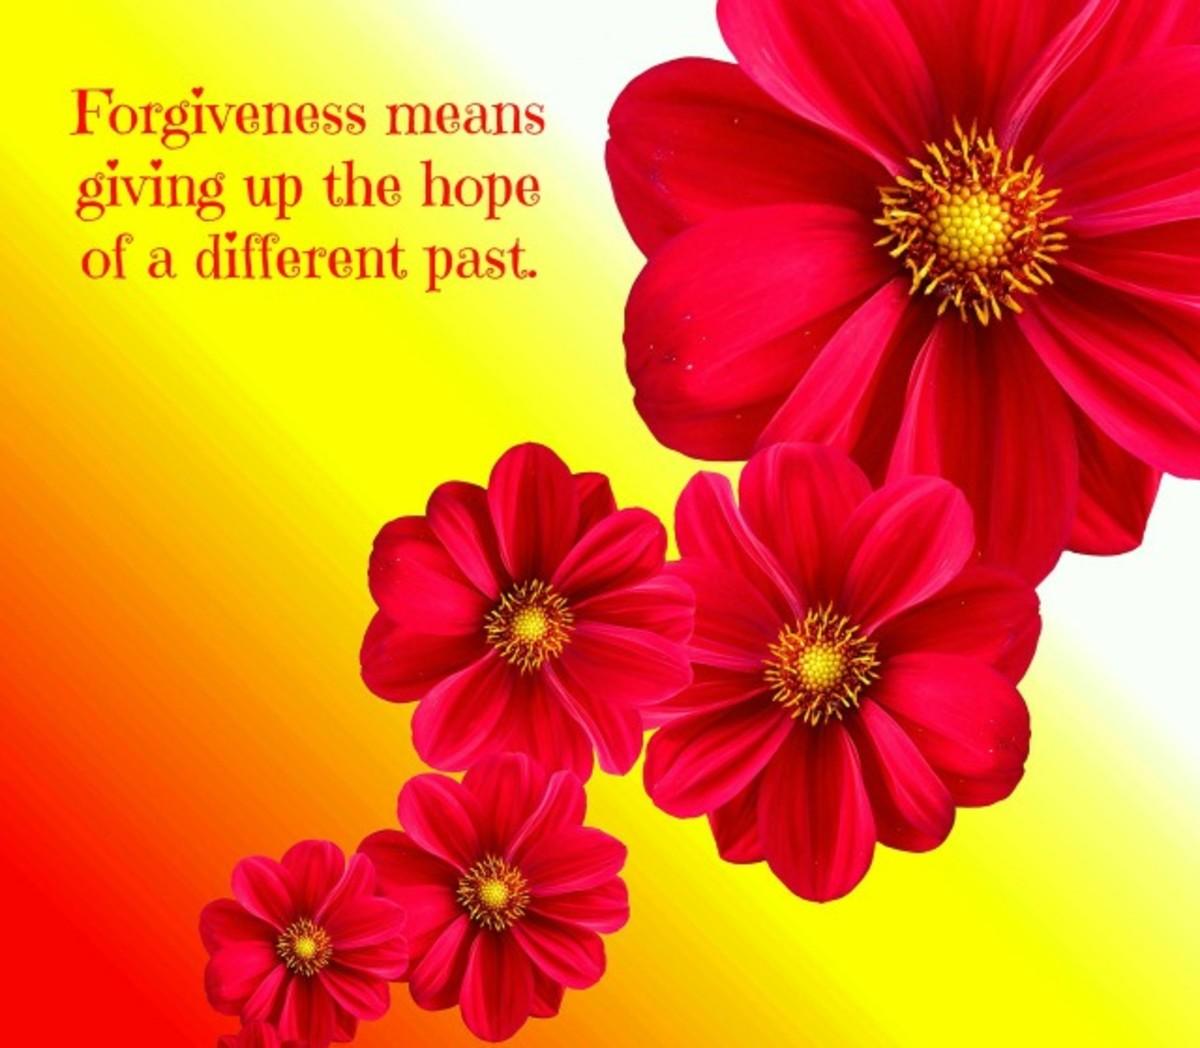 An inspirational poster about forgiveness.